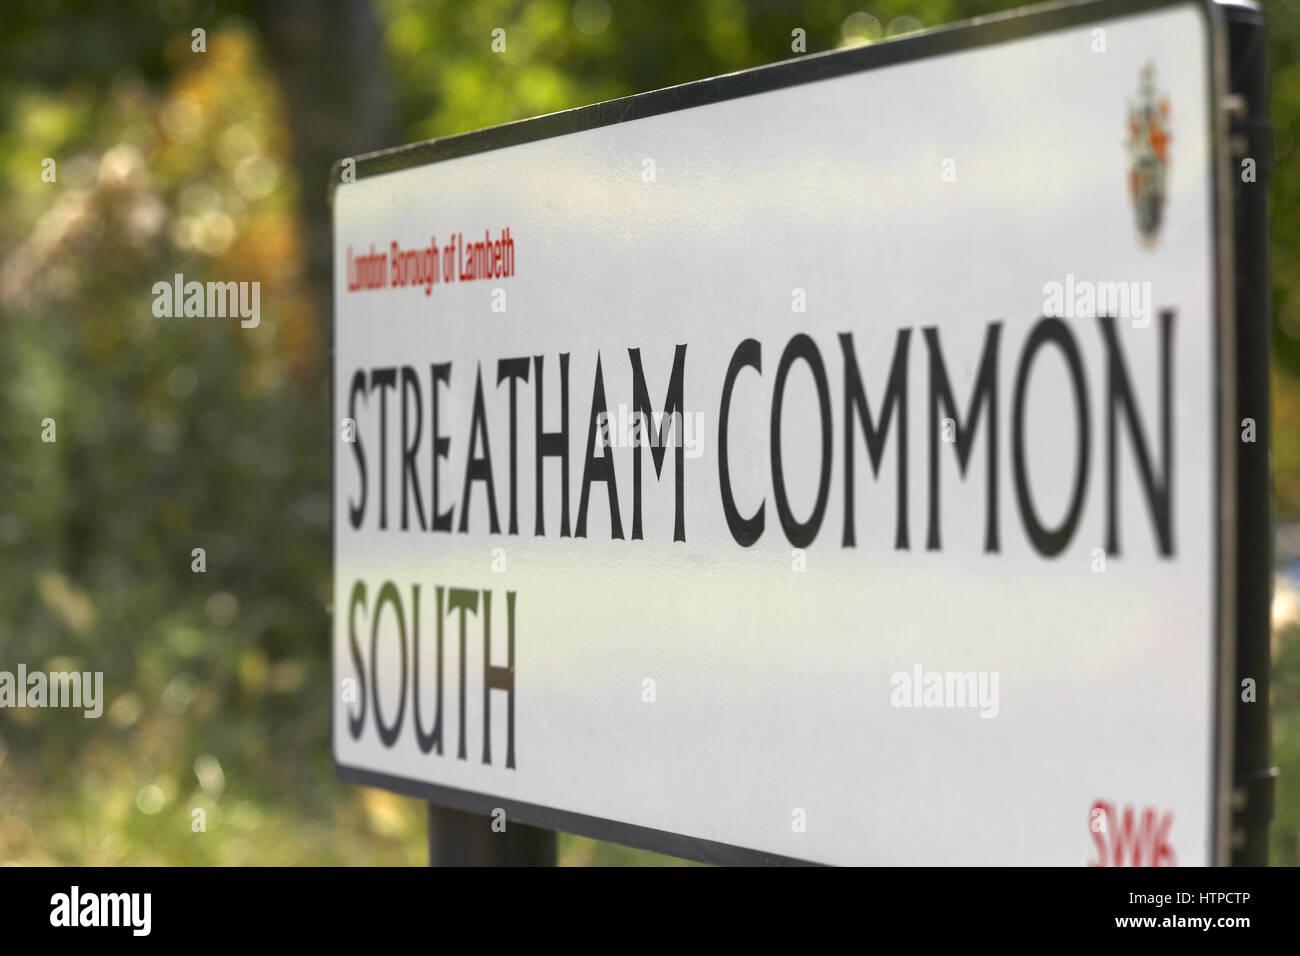 Streatham Common - Stock Image